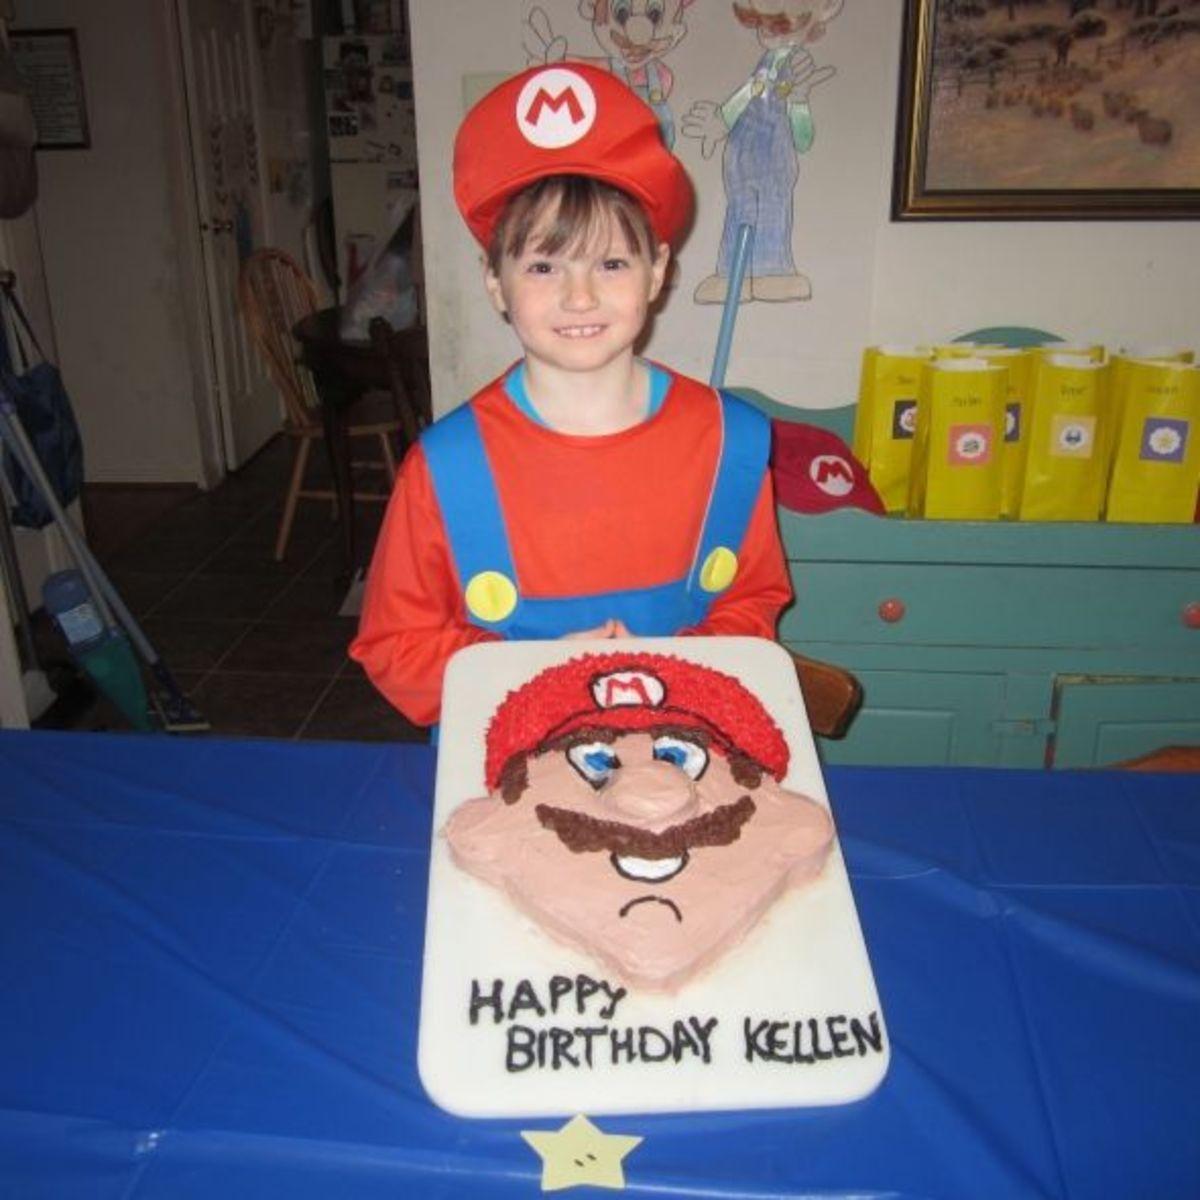 How to Make a Mario Birthday Cake